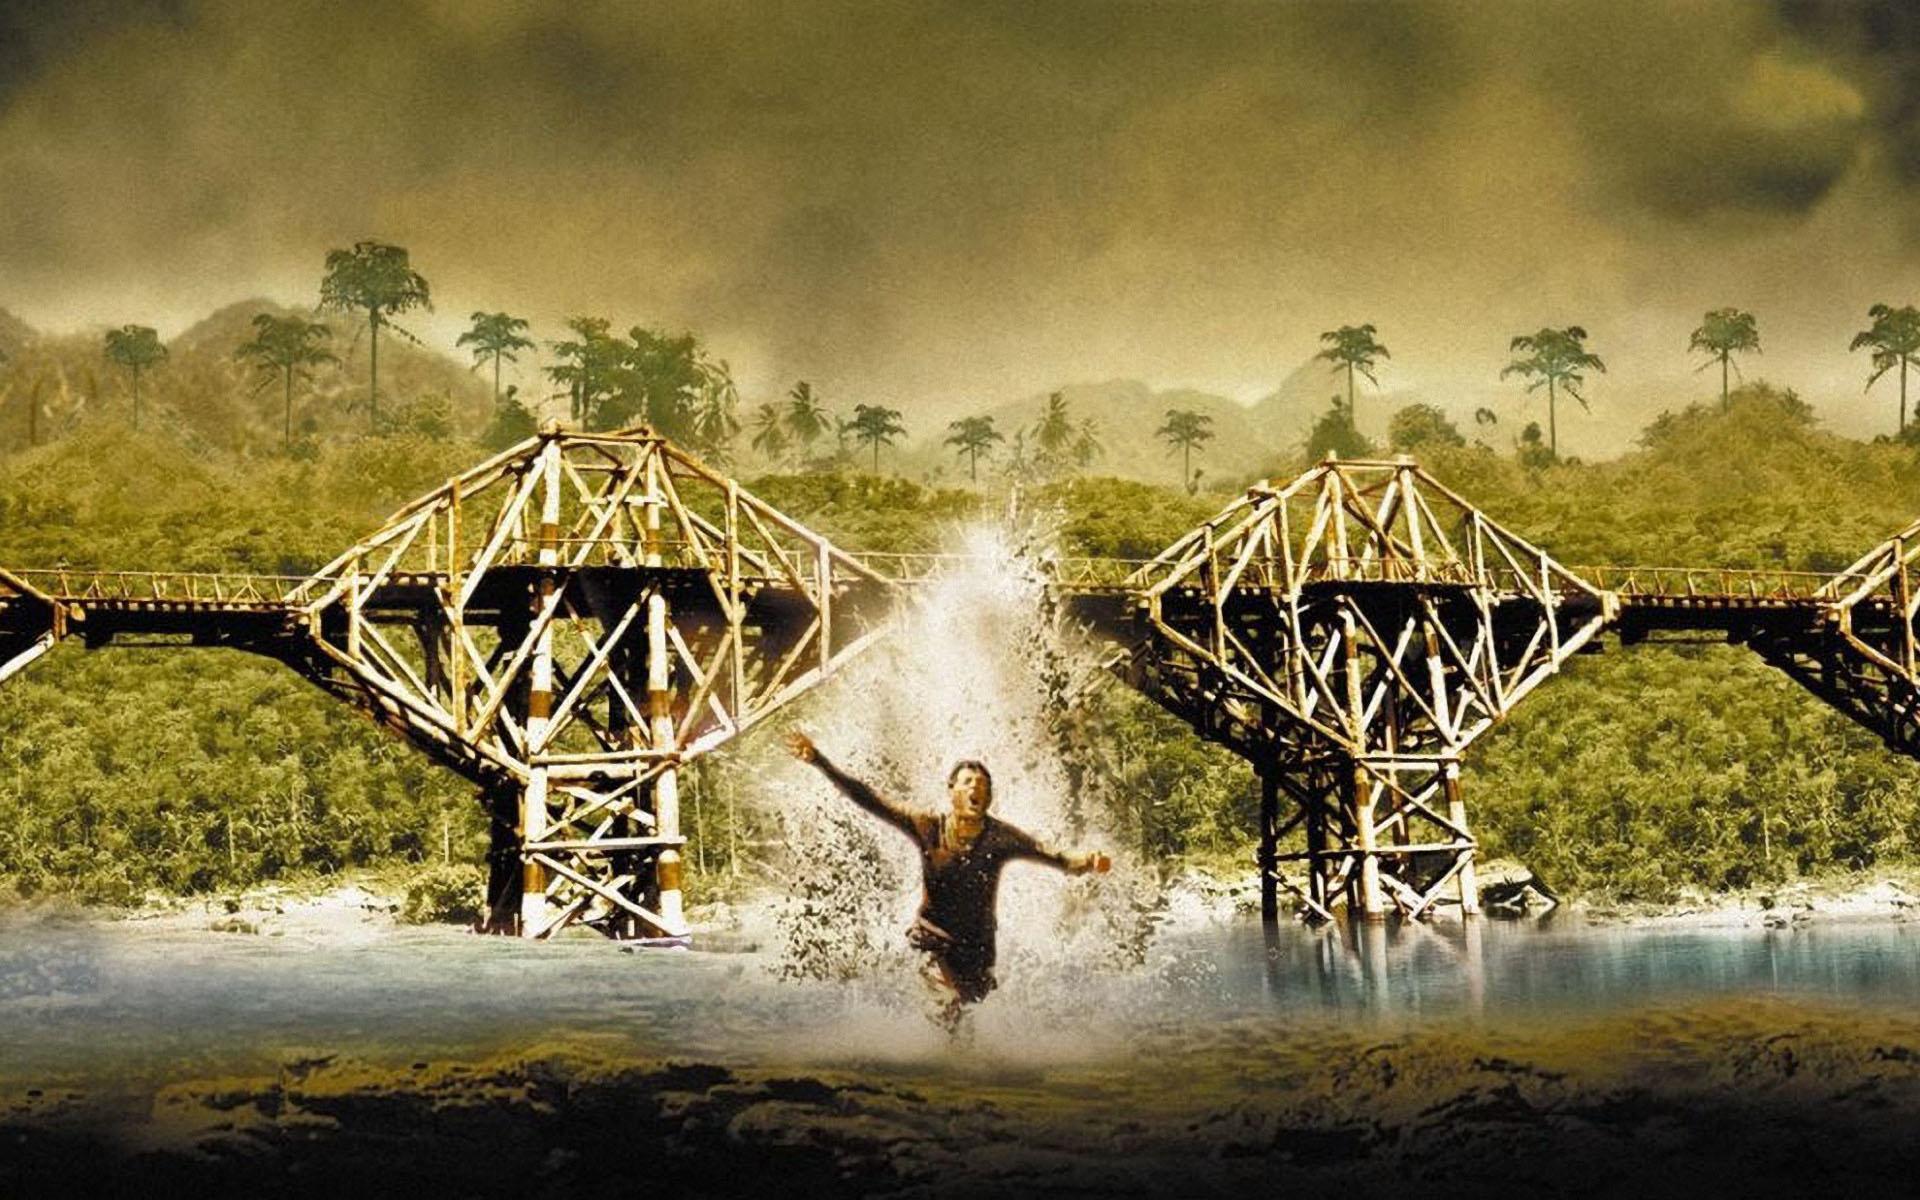 the_bridge_on_the_river_kwai_59603-1920x1200